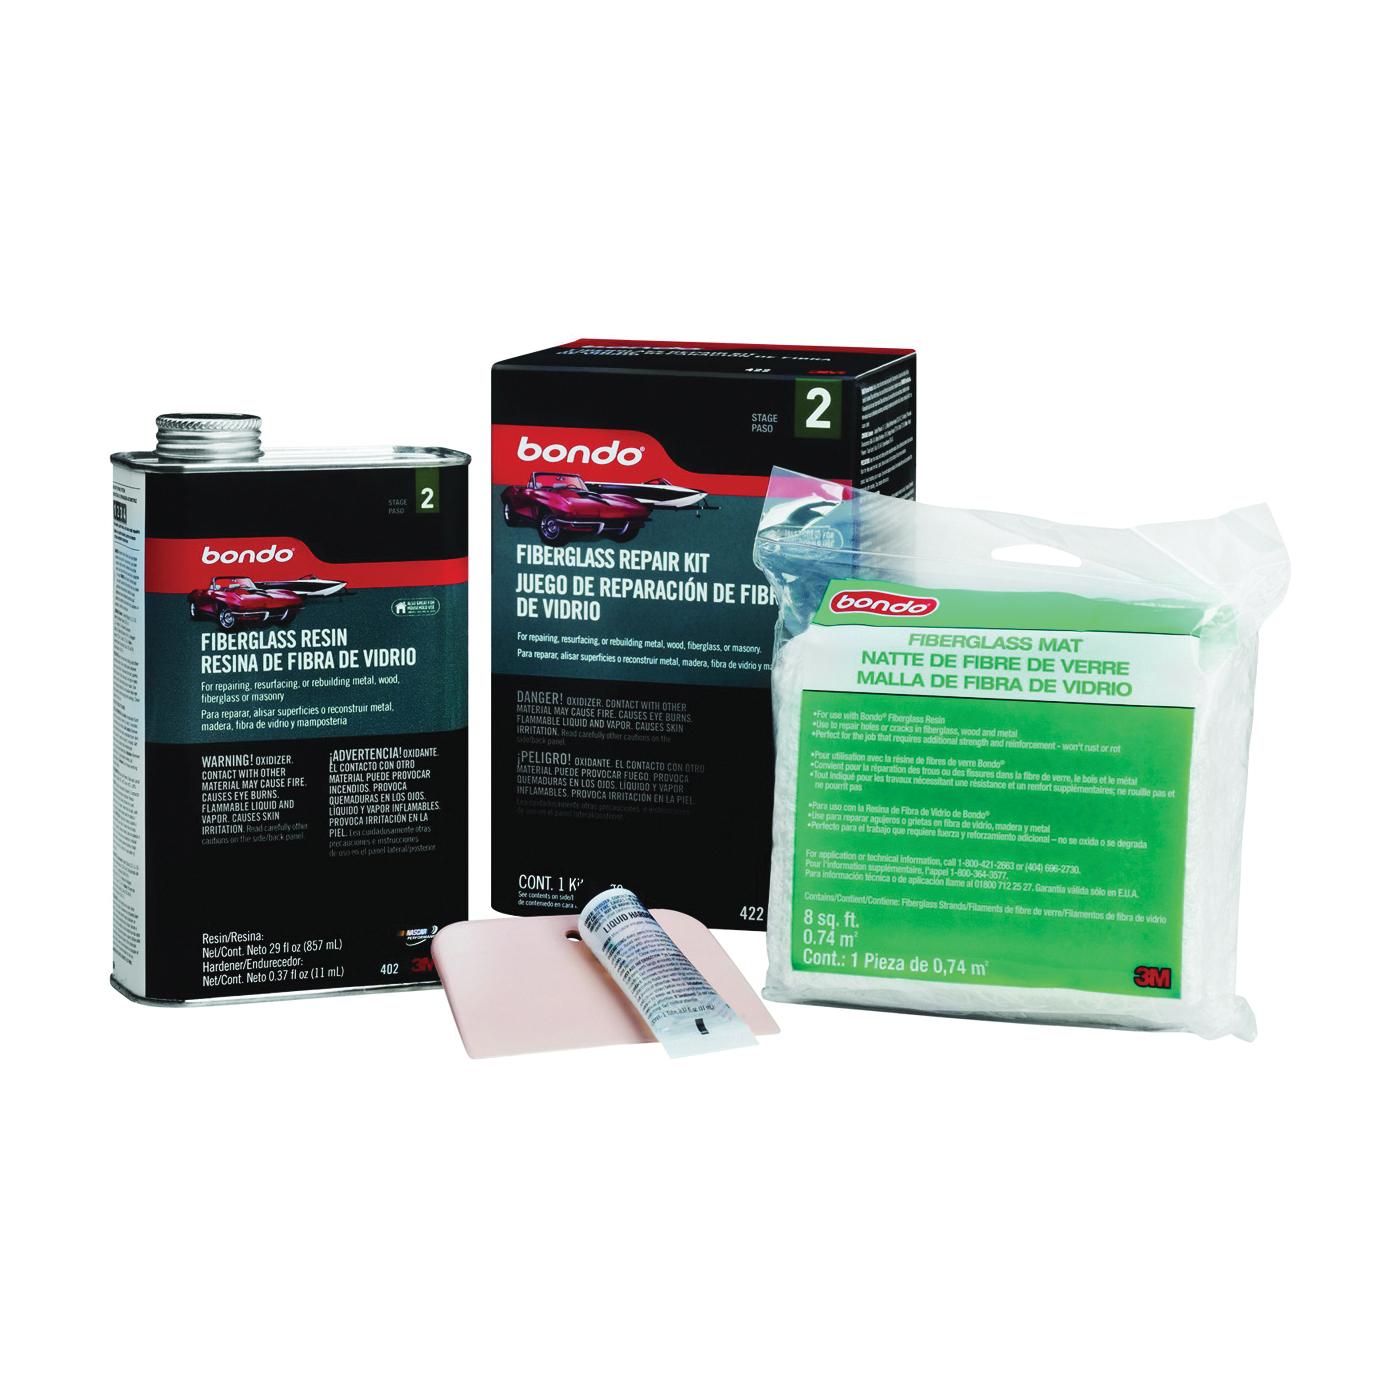 Picture of Bondo 422 Fiberglass Resin Repair Kit Can, Can, Liquid, Pungent Organic